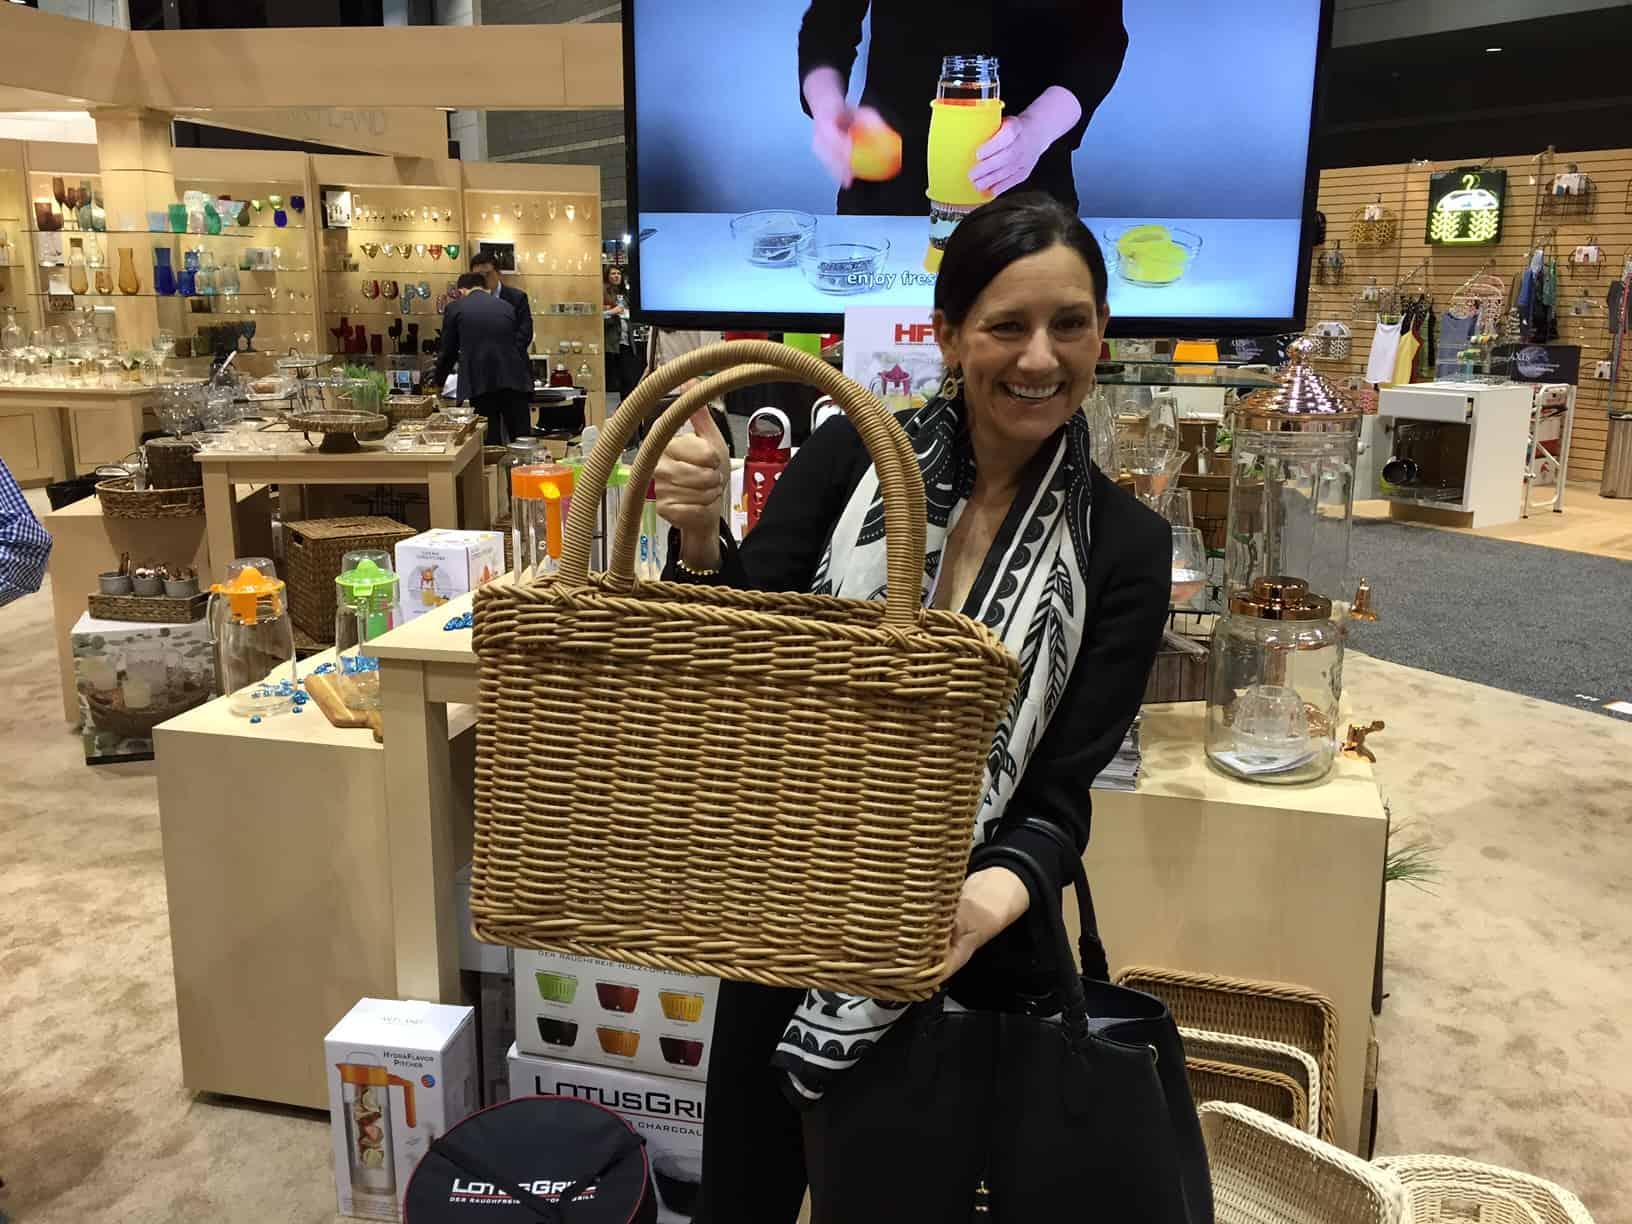 Awesome Basket made out of Poloypropolene by Artland